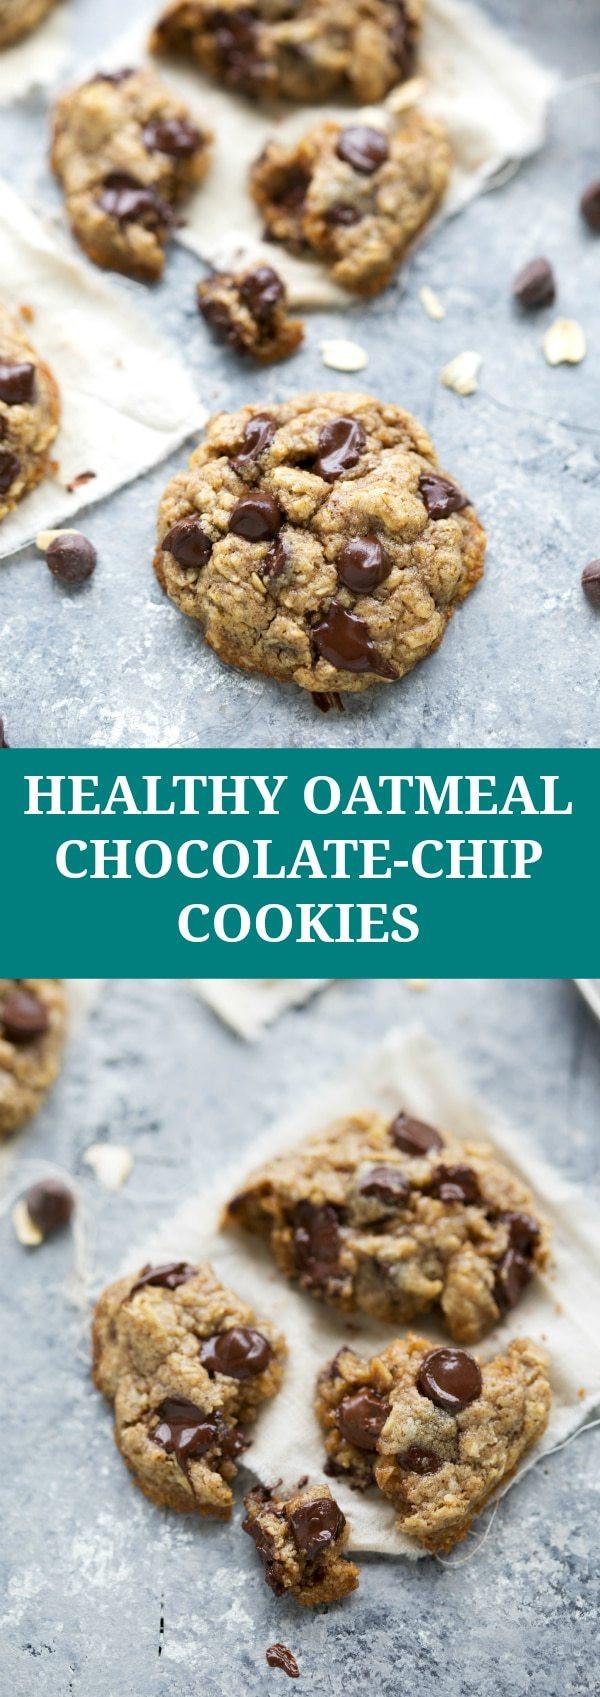 Healthy Oatmeal Raisin Chocolate Chip Cookies  easy healthy oatmeal chocolate chip cookie recipe